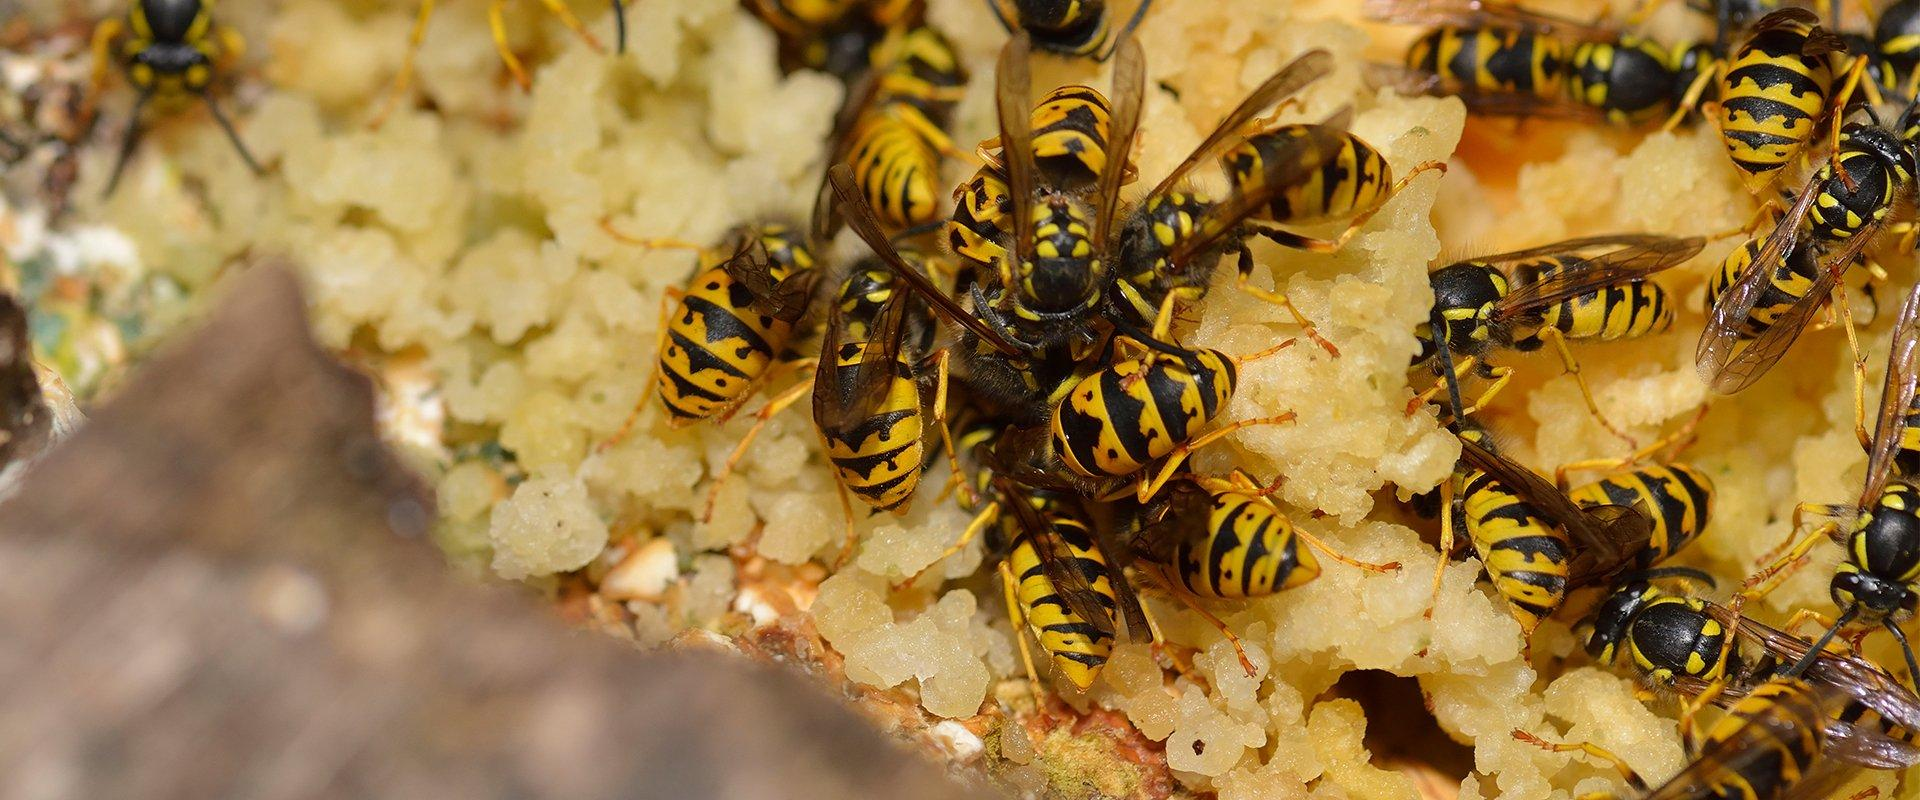 wasps eating food